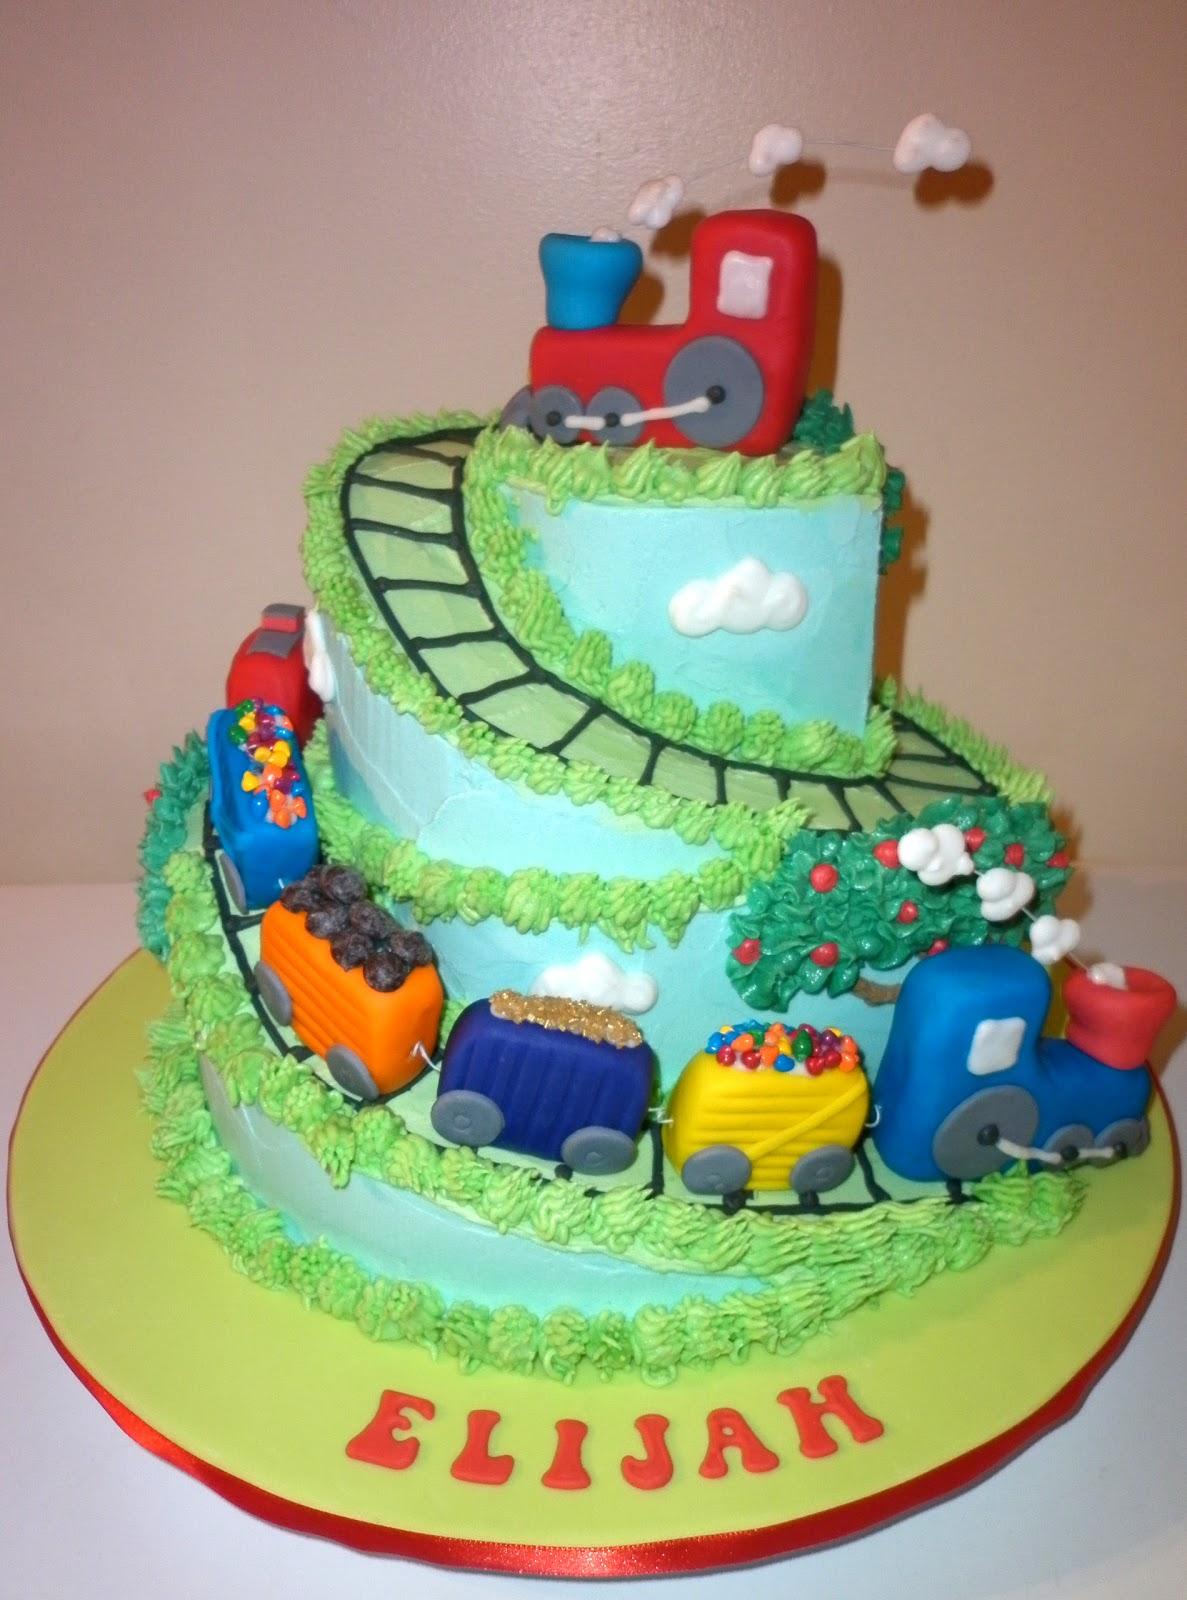 HD wallpapers children s birthday cake design ideas